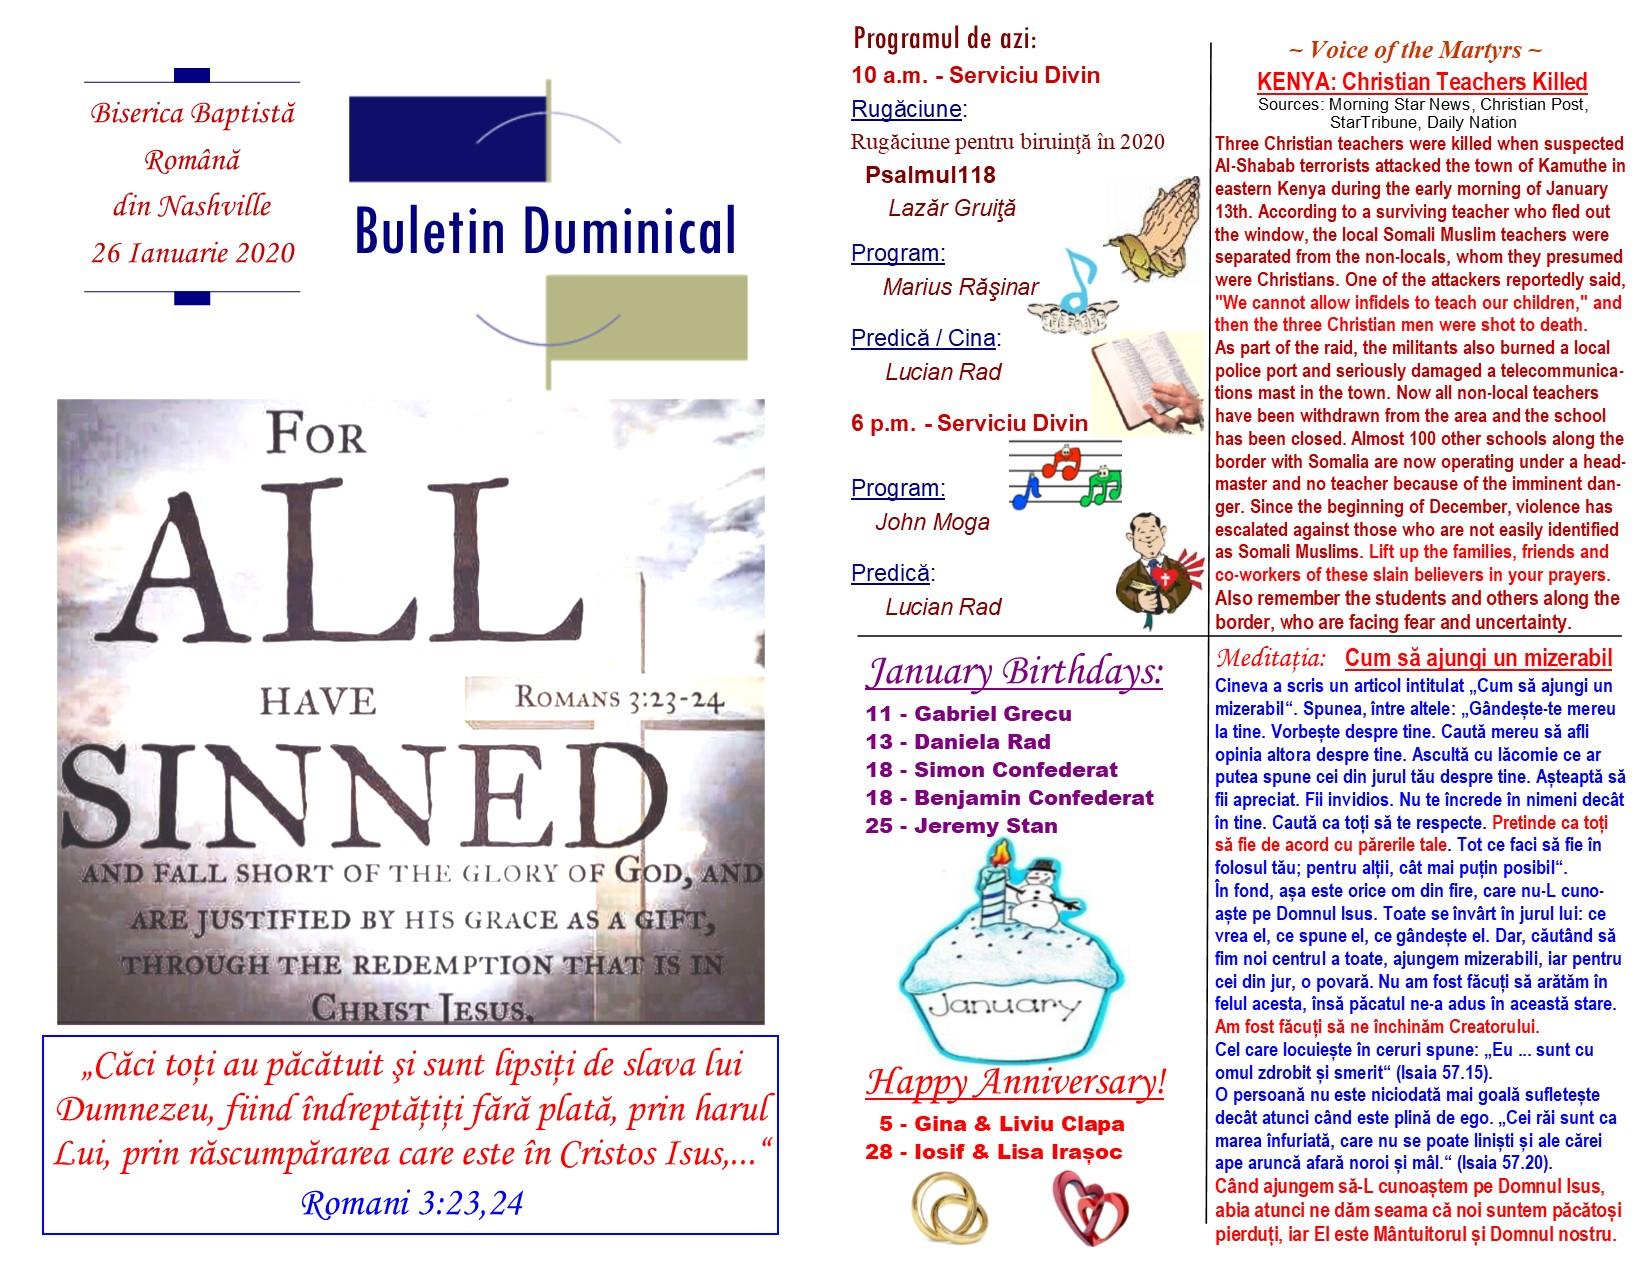 Buletin 01-26-20 page 1 & 2